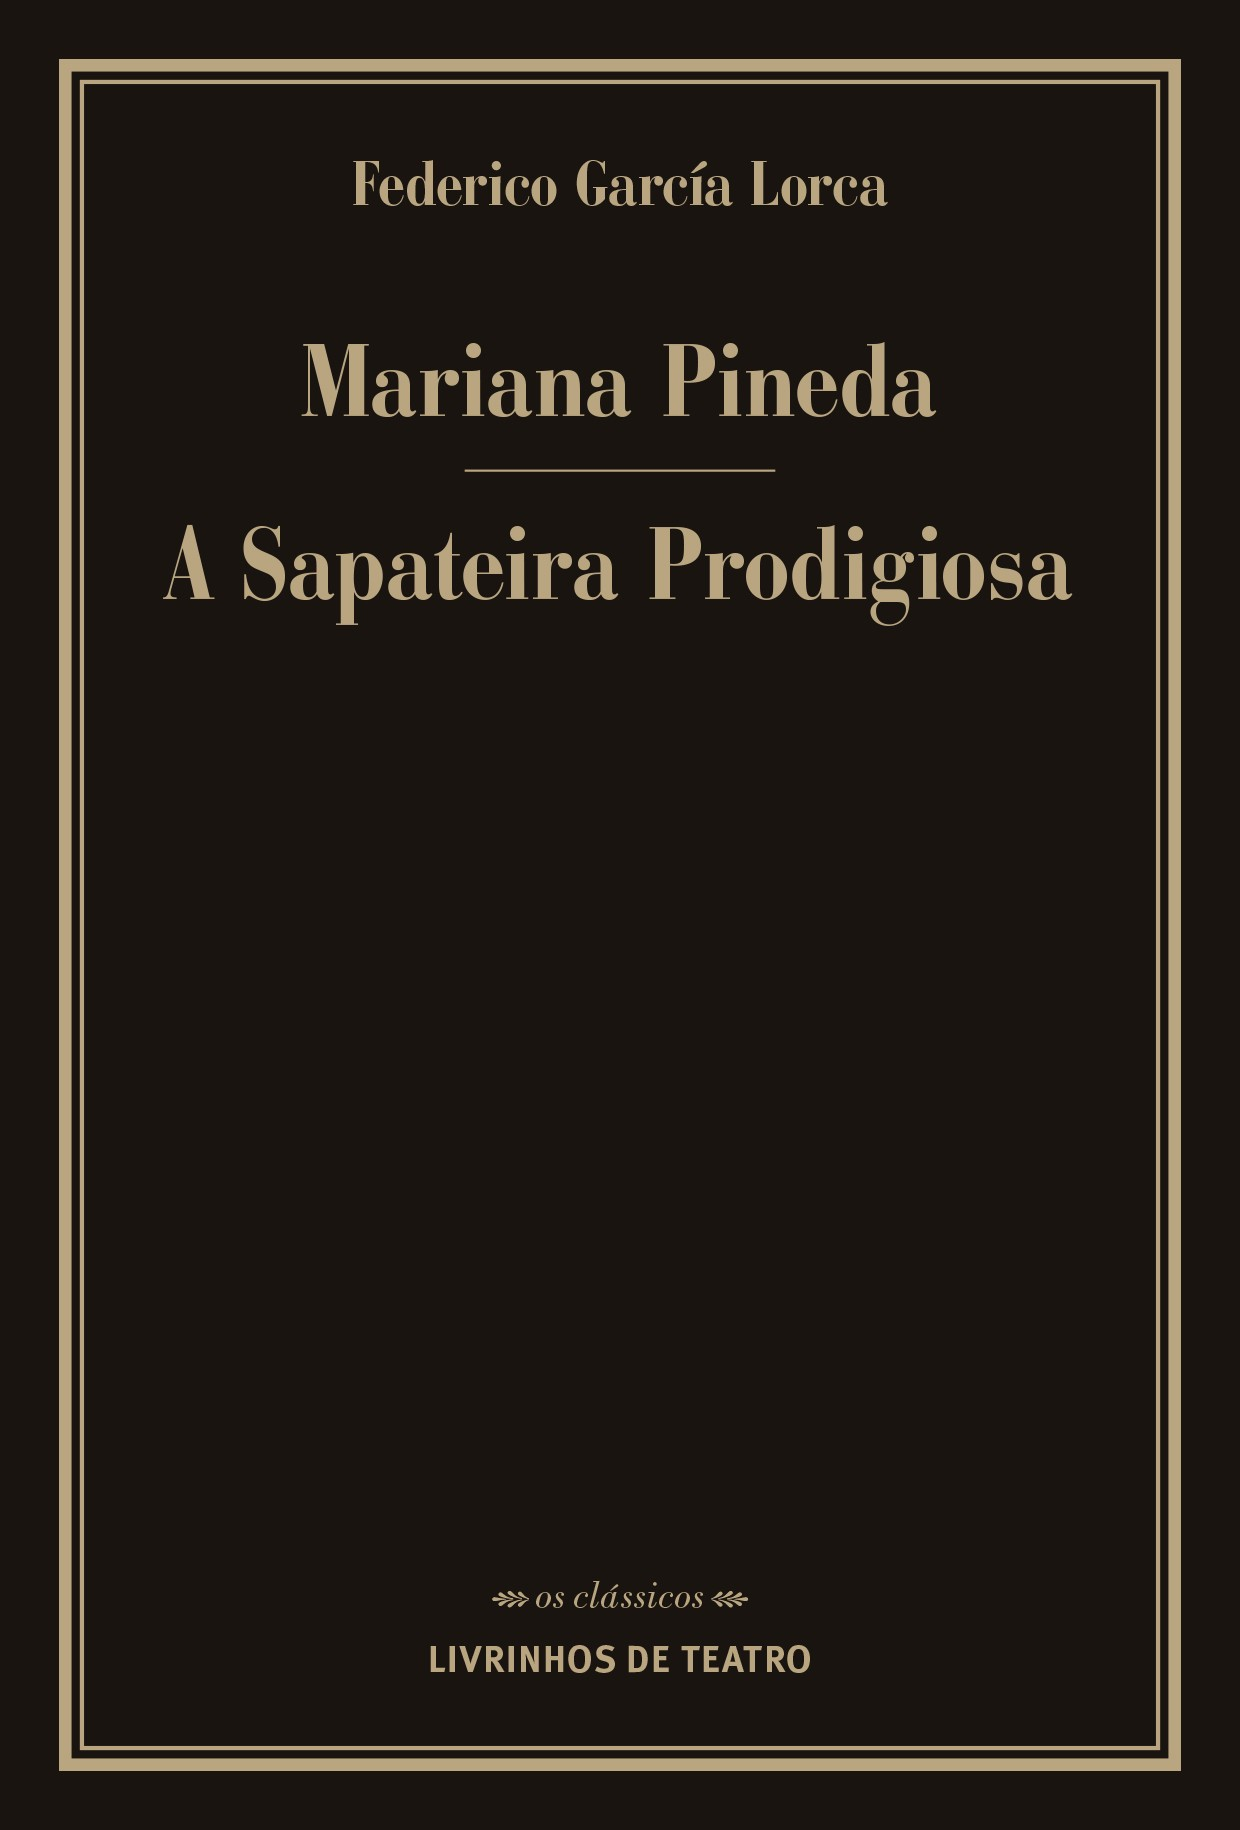 MARIANA PINEDA / A SAPATEIRA PRODIGIOSA